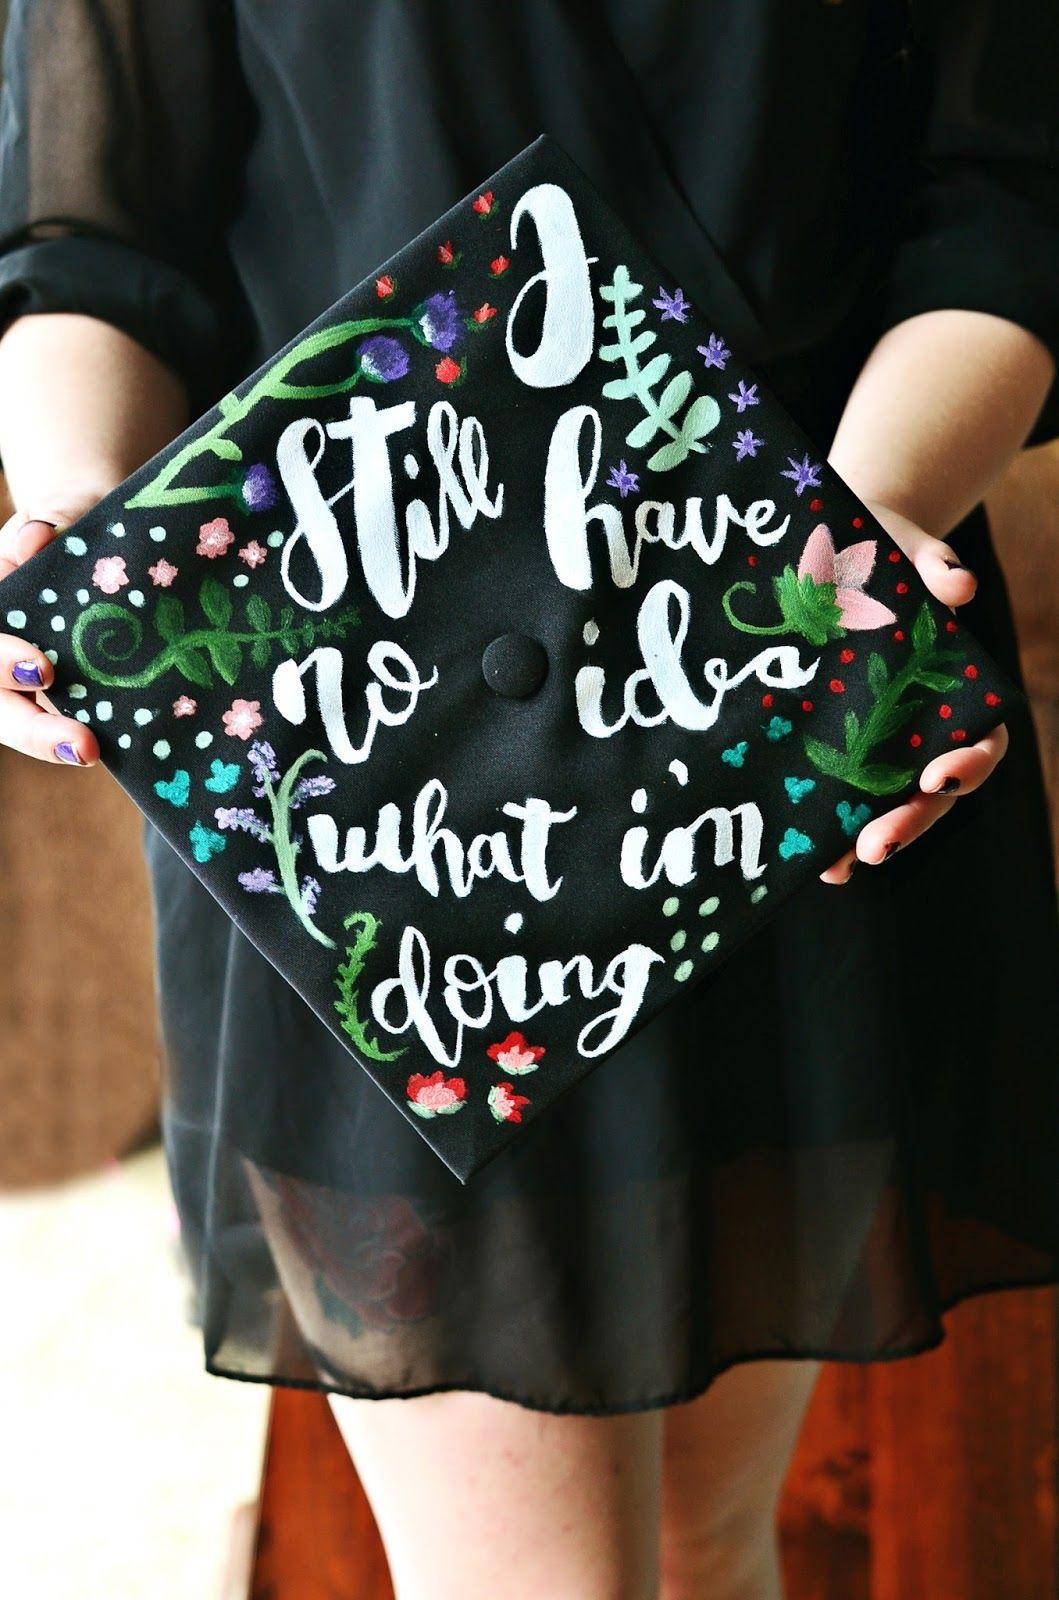 Decorating graduation cap ideas for teachers - Graduation Cap Decoration Idea I Still Have No Idea What I M Doing